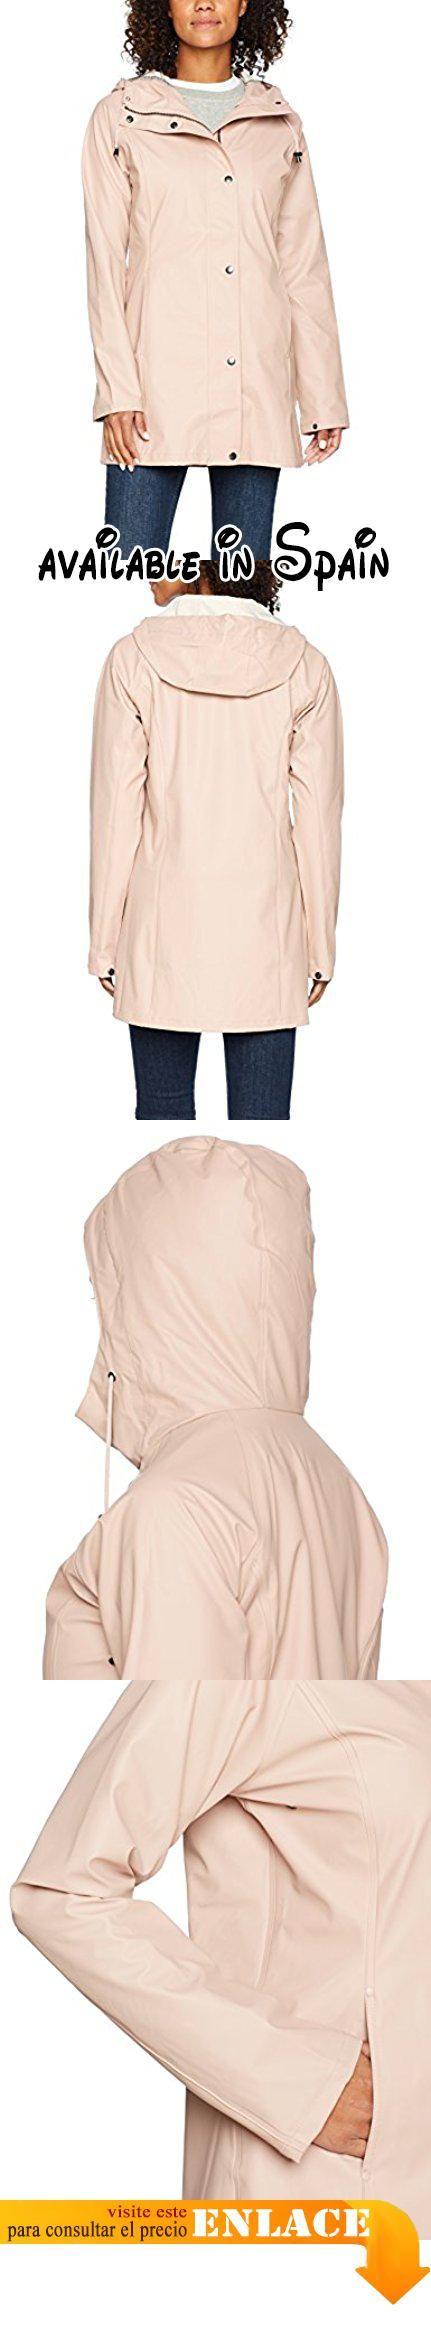 B074JCJGMX : Ilse Jacobsen Damen Regenjacke RAIN87 Chaqueta Impermeable para Mujer Rosa (Adobe Rose 378) 38. #Ropa #OUTERWEAR